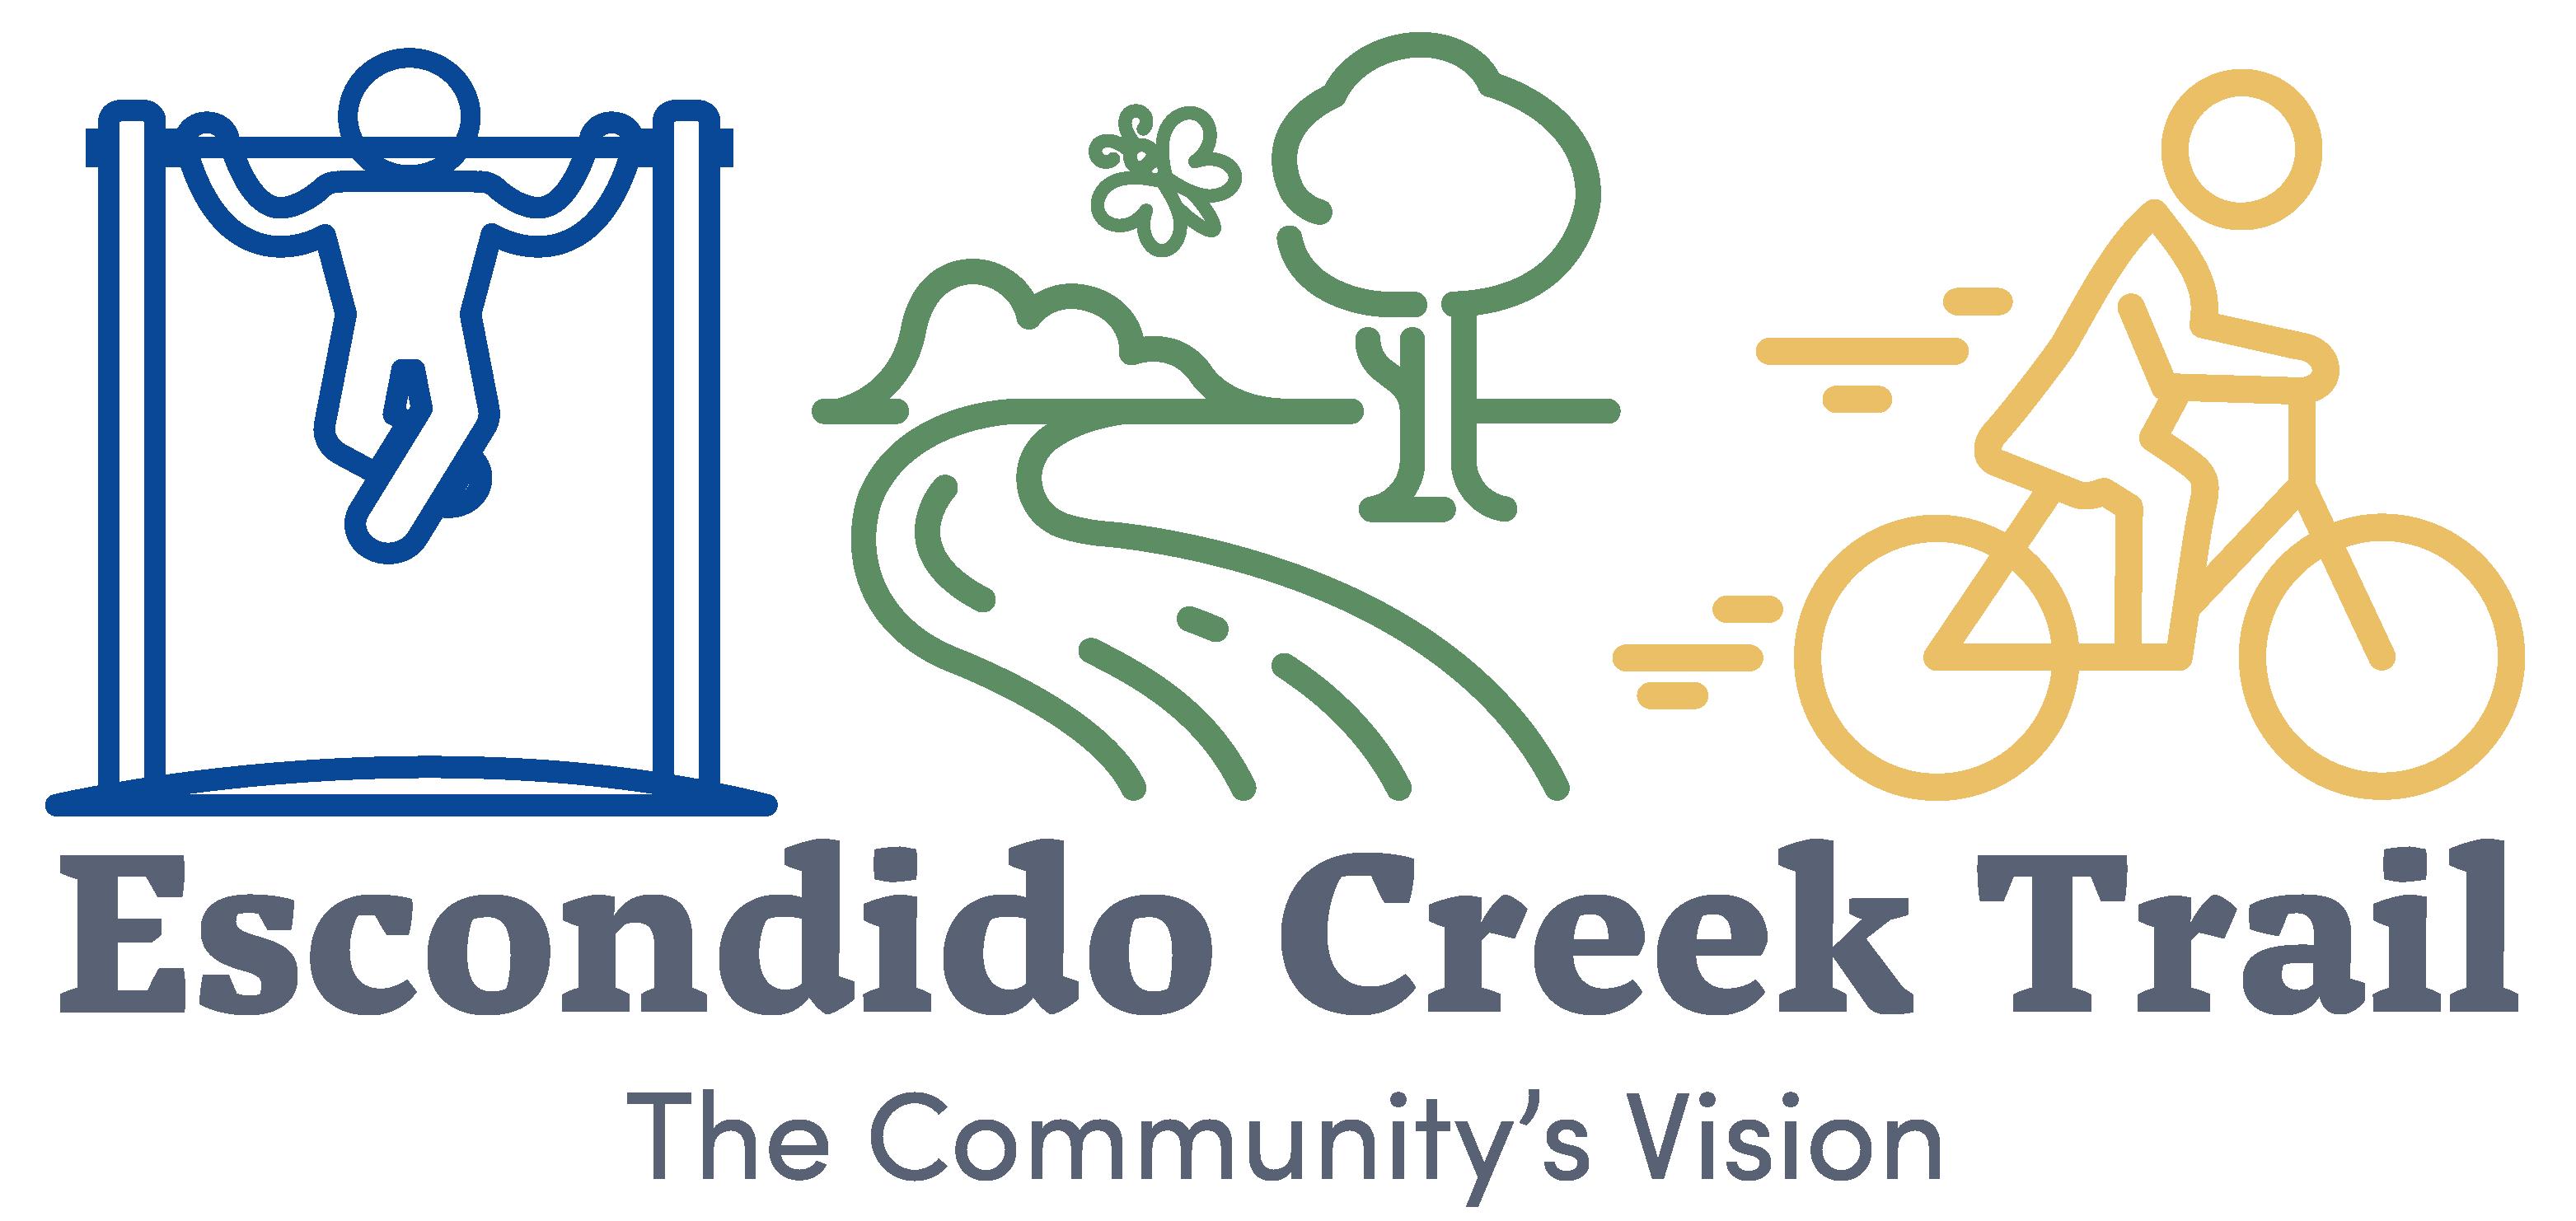 Escondido Creek Trail Logo